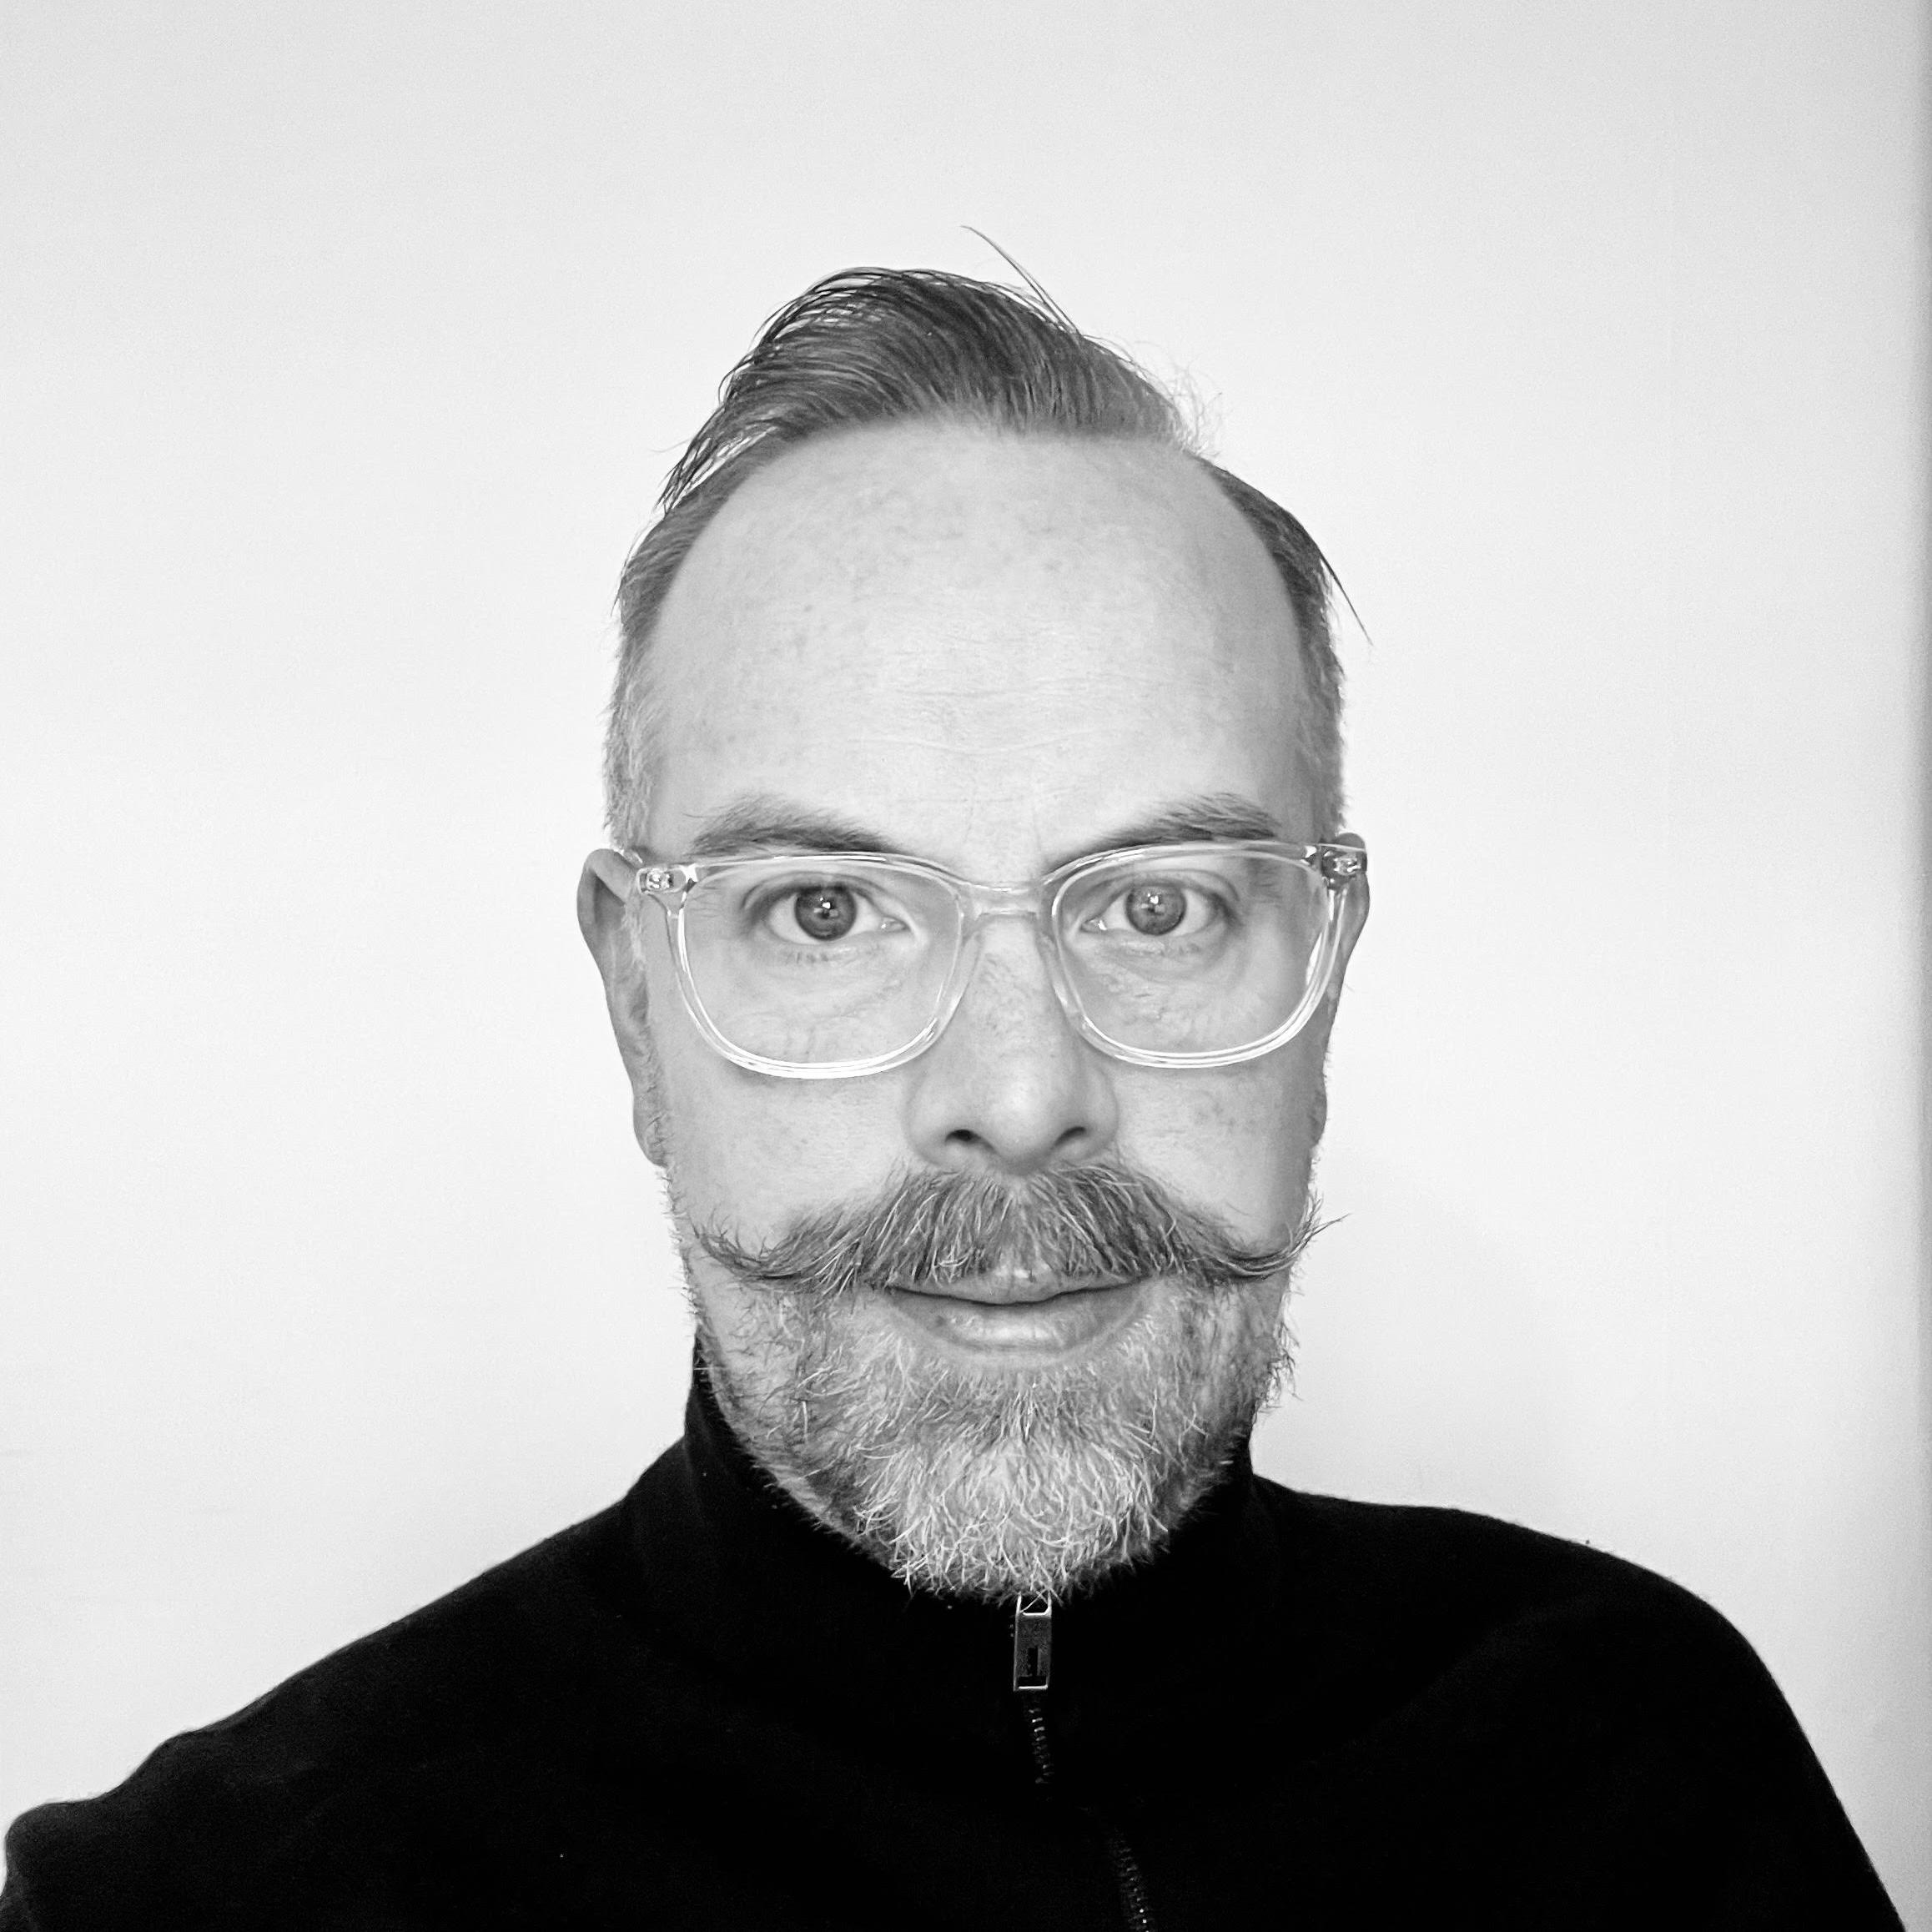 https://www.bullhorn.com/uk/wp-content/uploads/sites/2/2021/02/Alastair-3.png